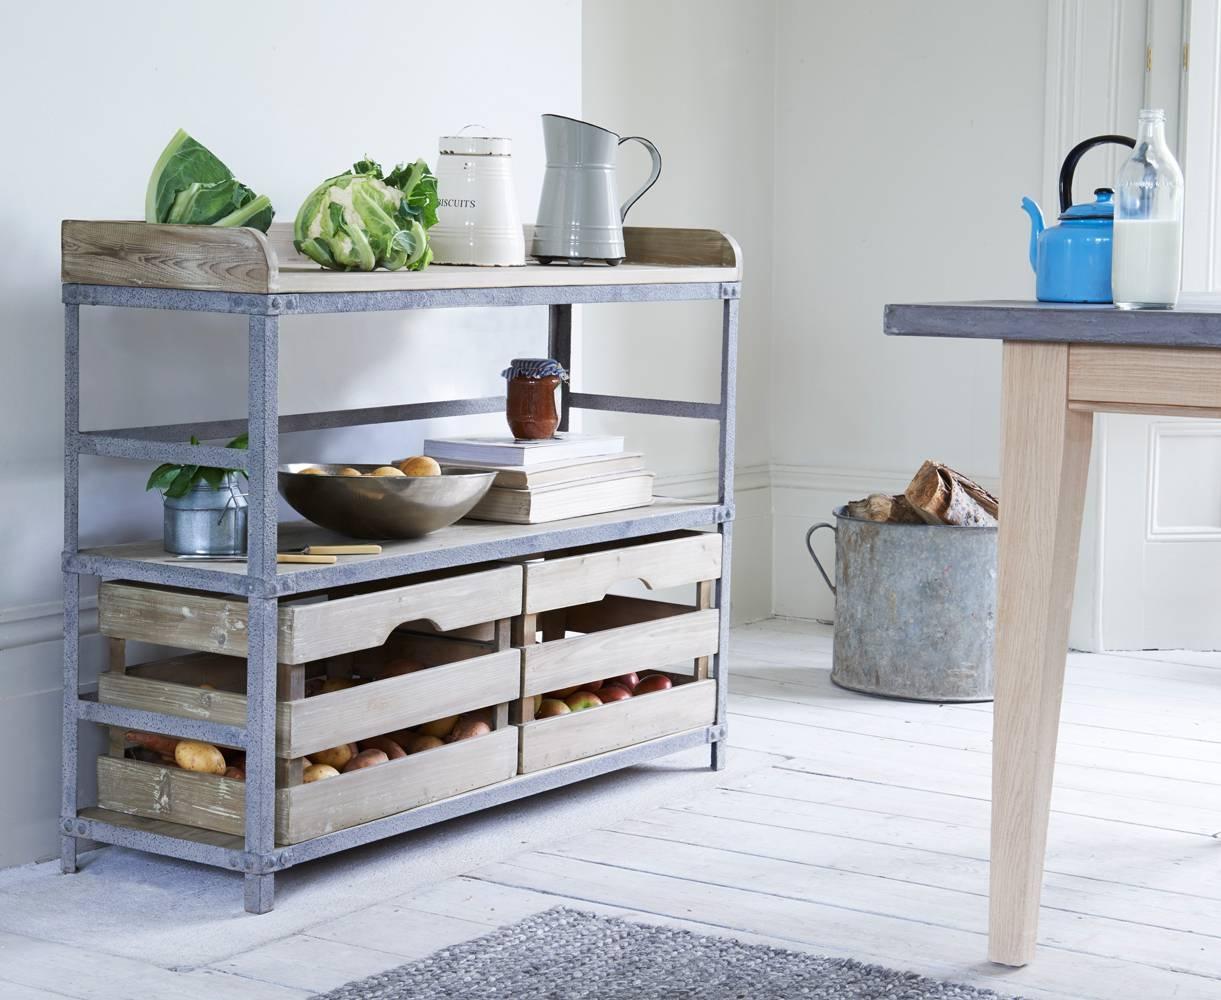 Rackety Sideboard | Industrial Kitchen Sideboard | Loaf Regarding Kitchen Sideboards (View 5 of 15)